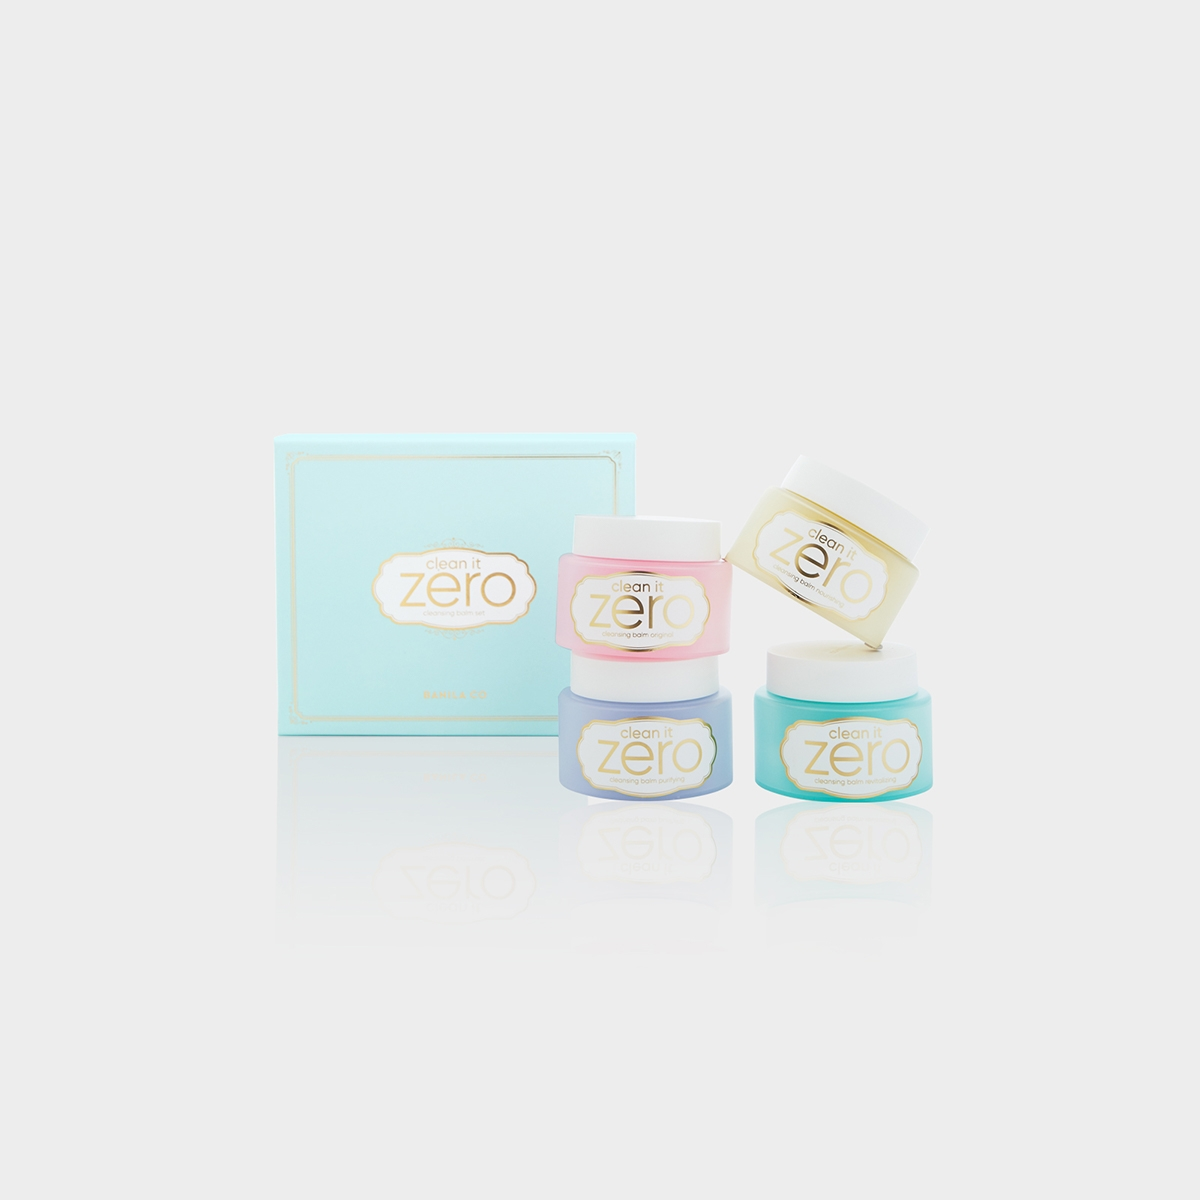 Banila Co Clean It Zero Set Macaron Limited Edition